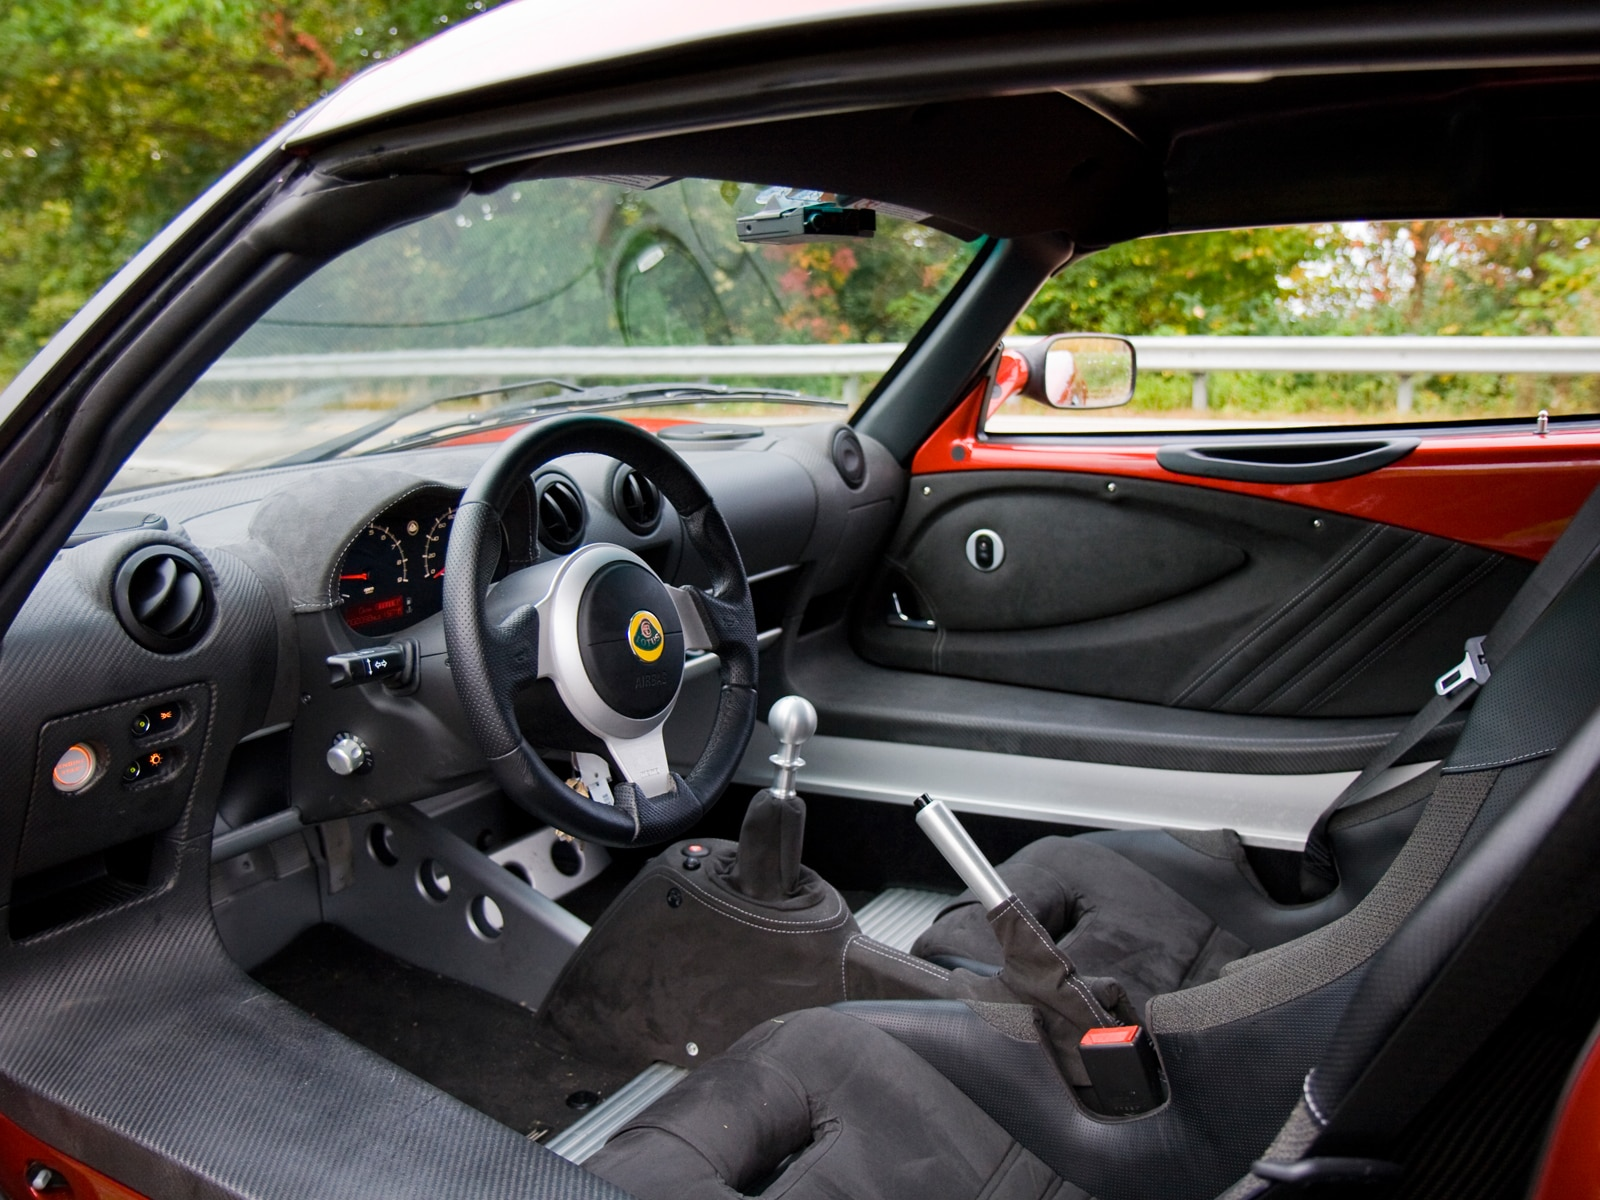 http://st.automobilemag.com/uploads/sites/11/2009/10/0910_10_z-2010_lotus_exige_260_s-interior.jpg